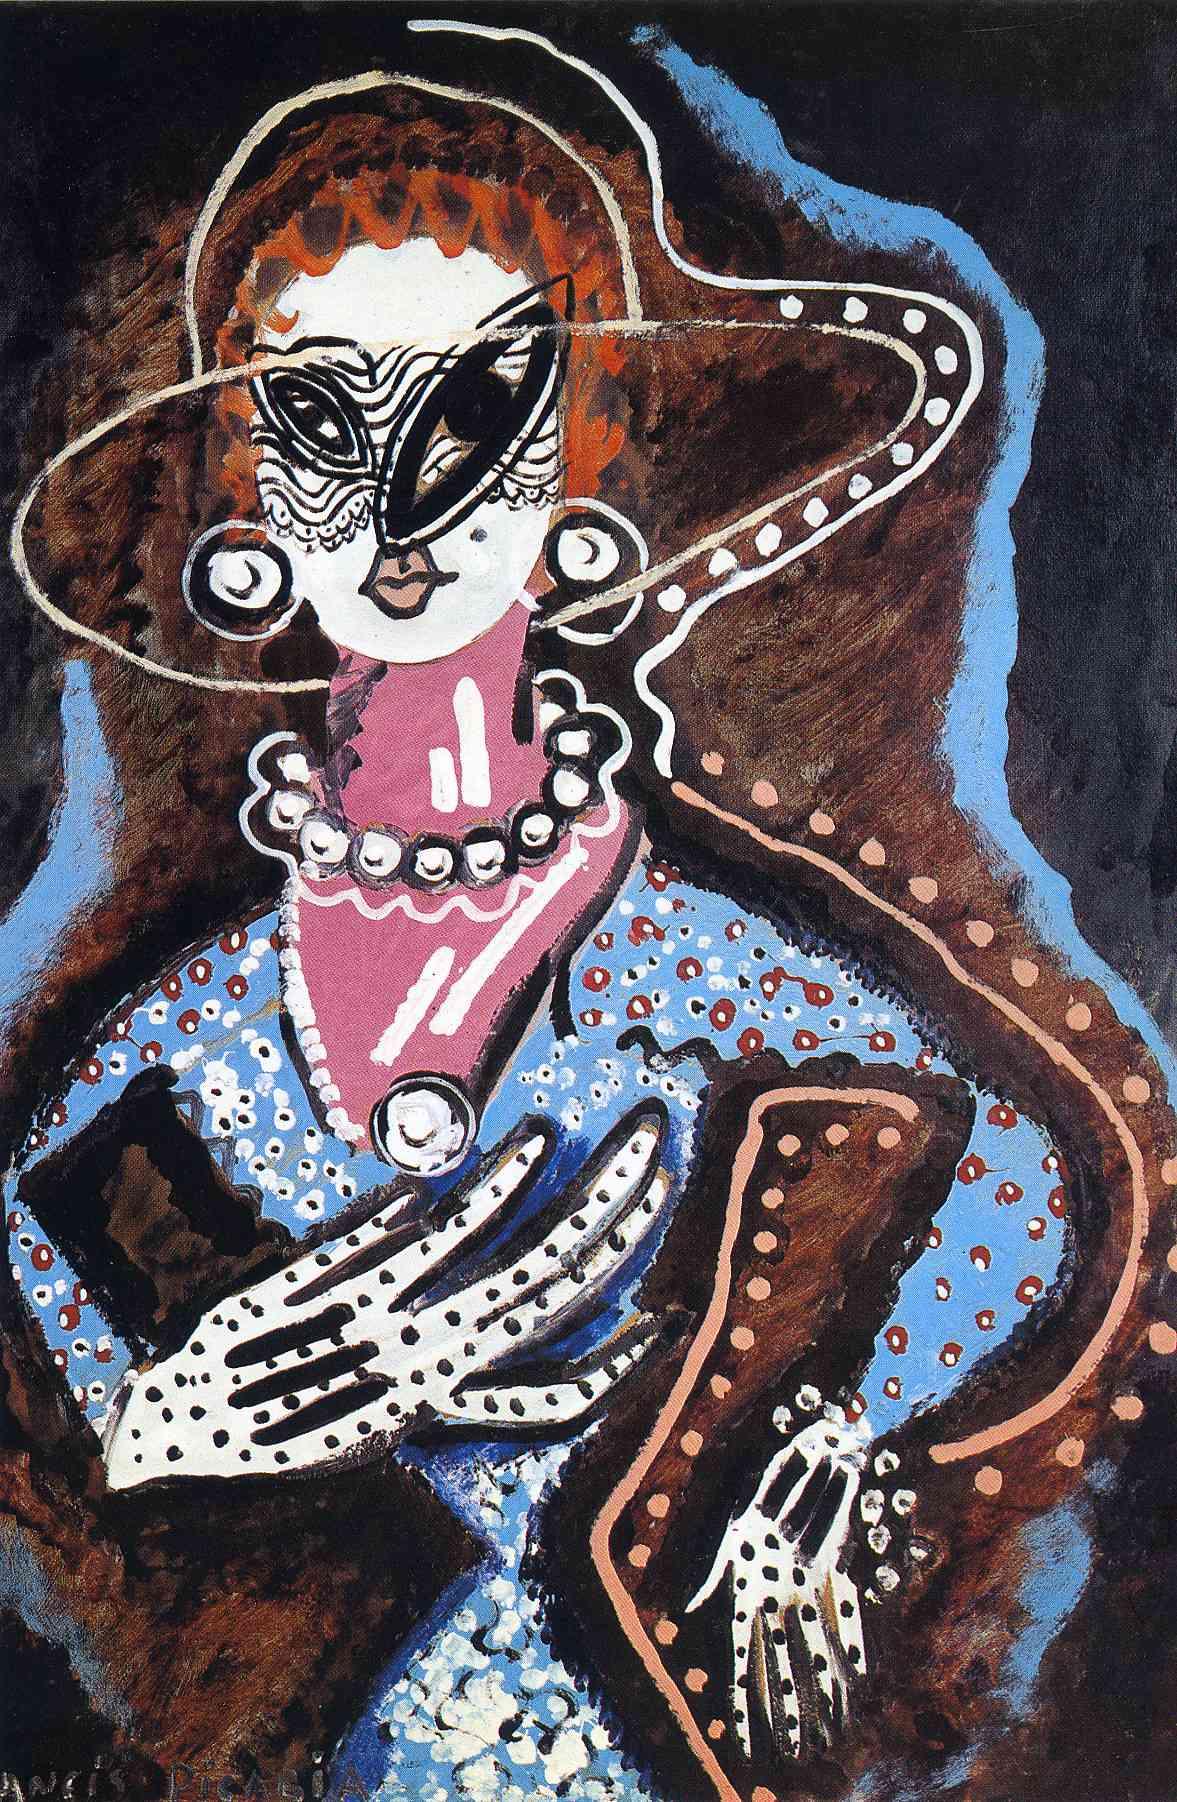 representational art visual arts encyclopedia - HD1177×1802